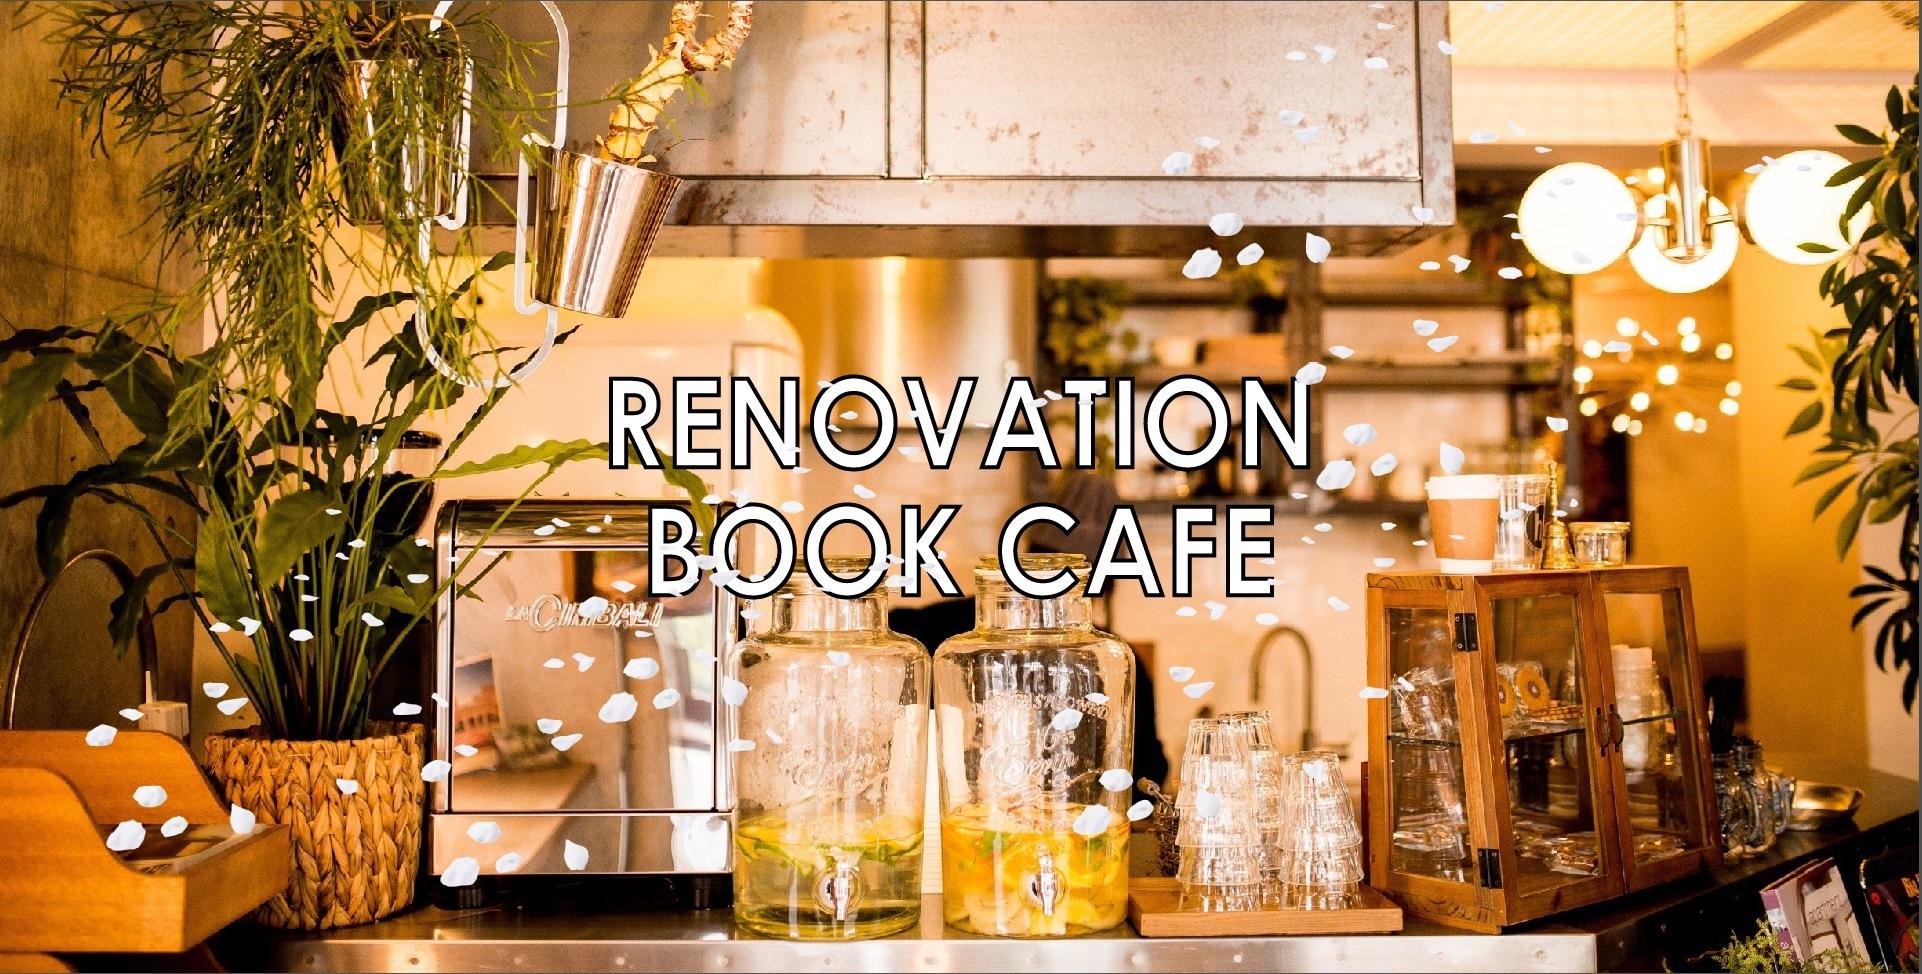 【RENOVATION BOOK CAFE】一時休業のお知らせ